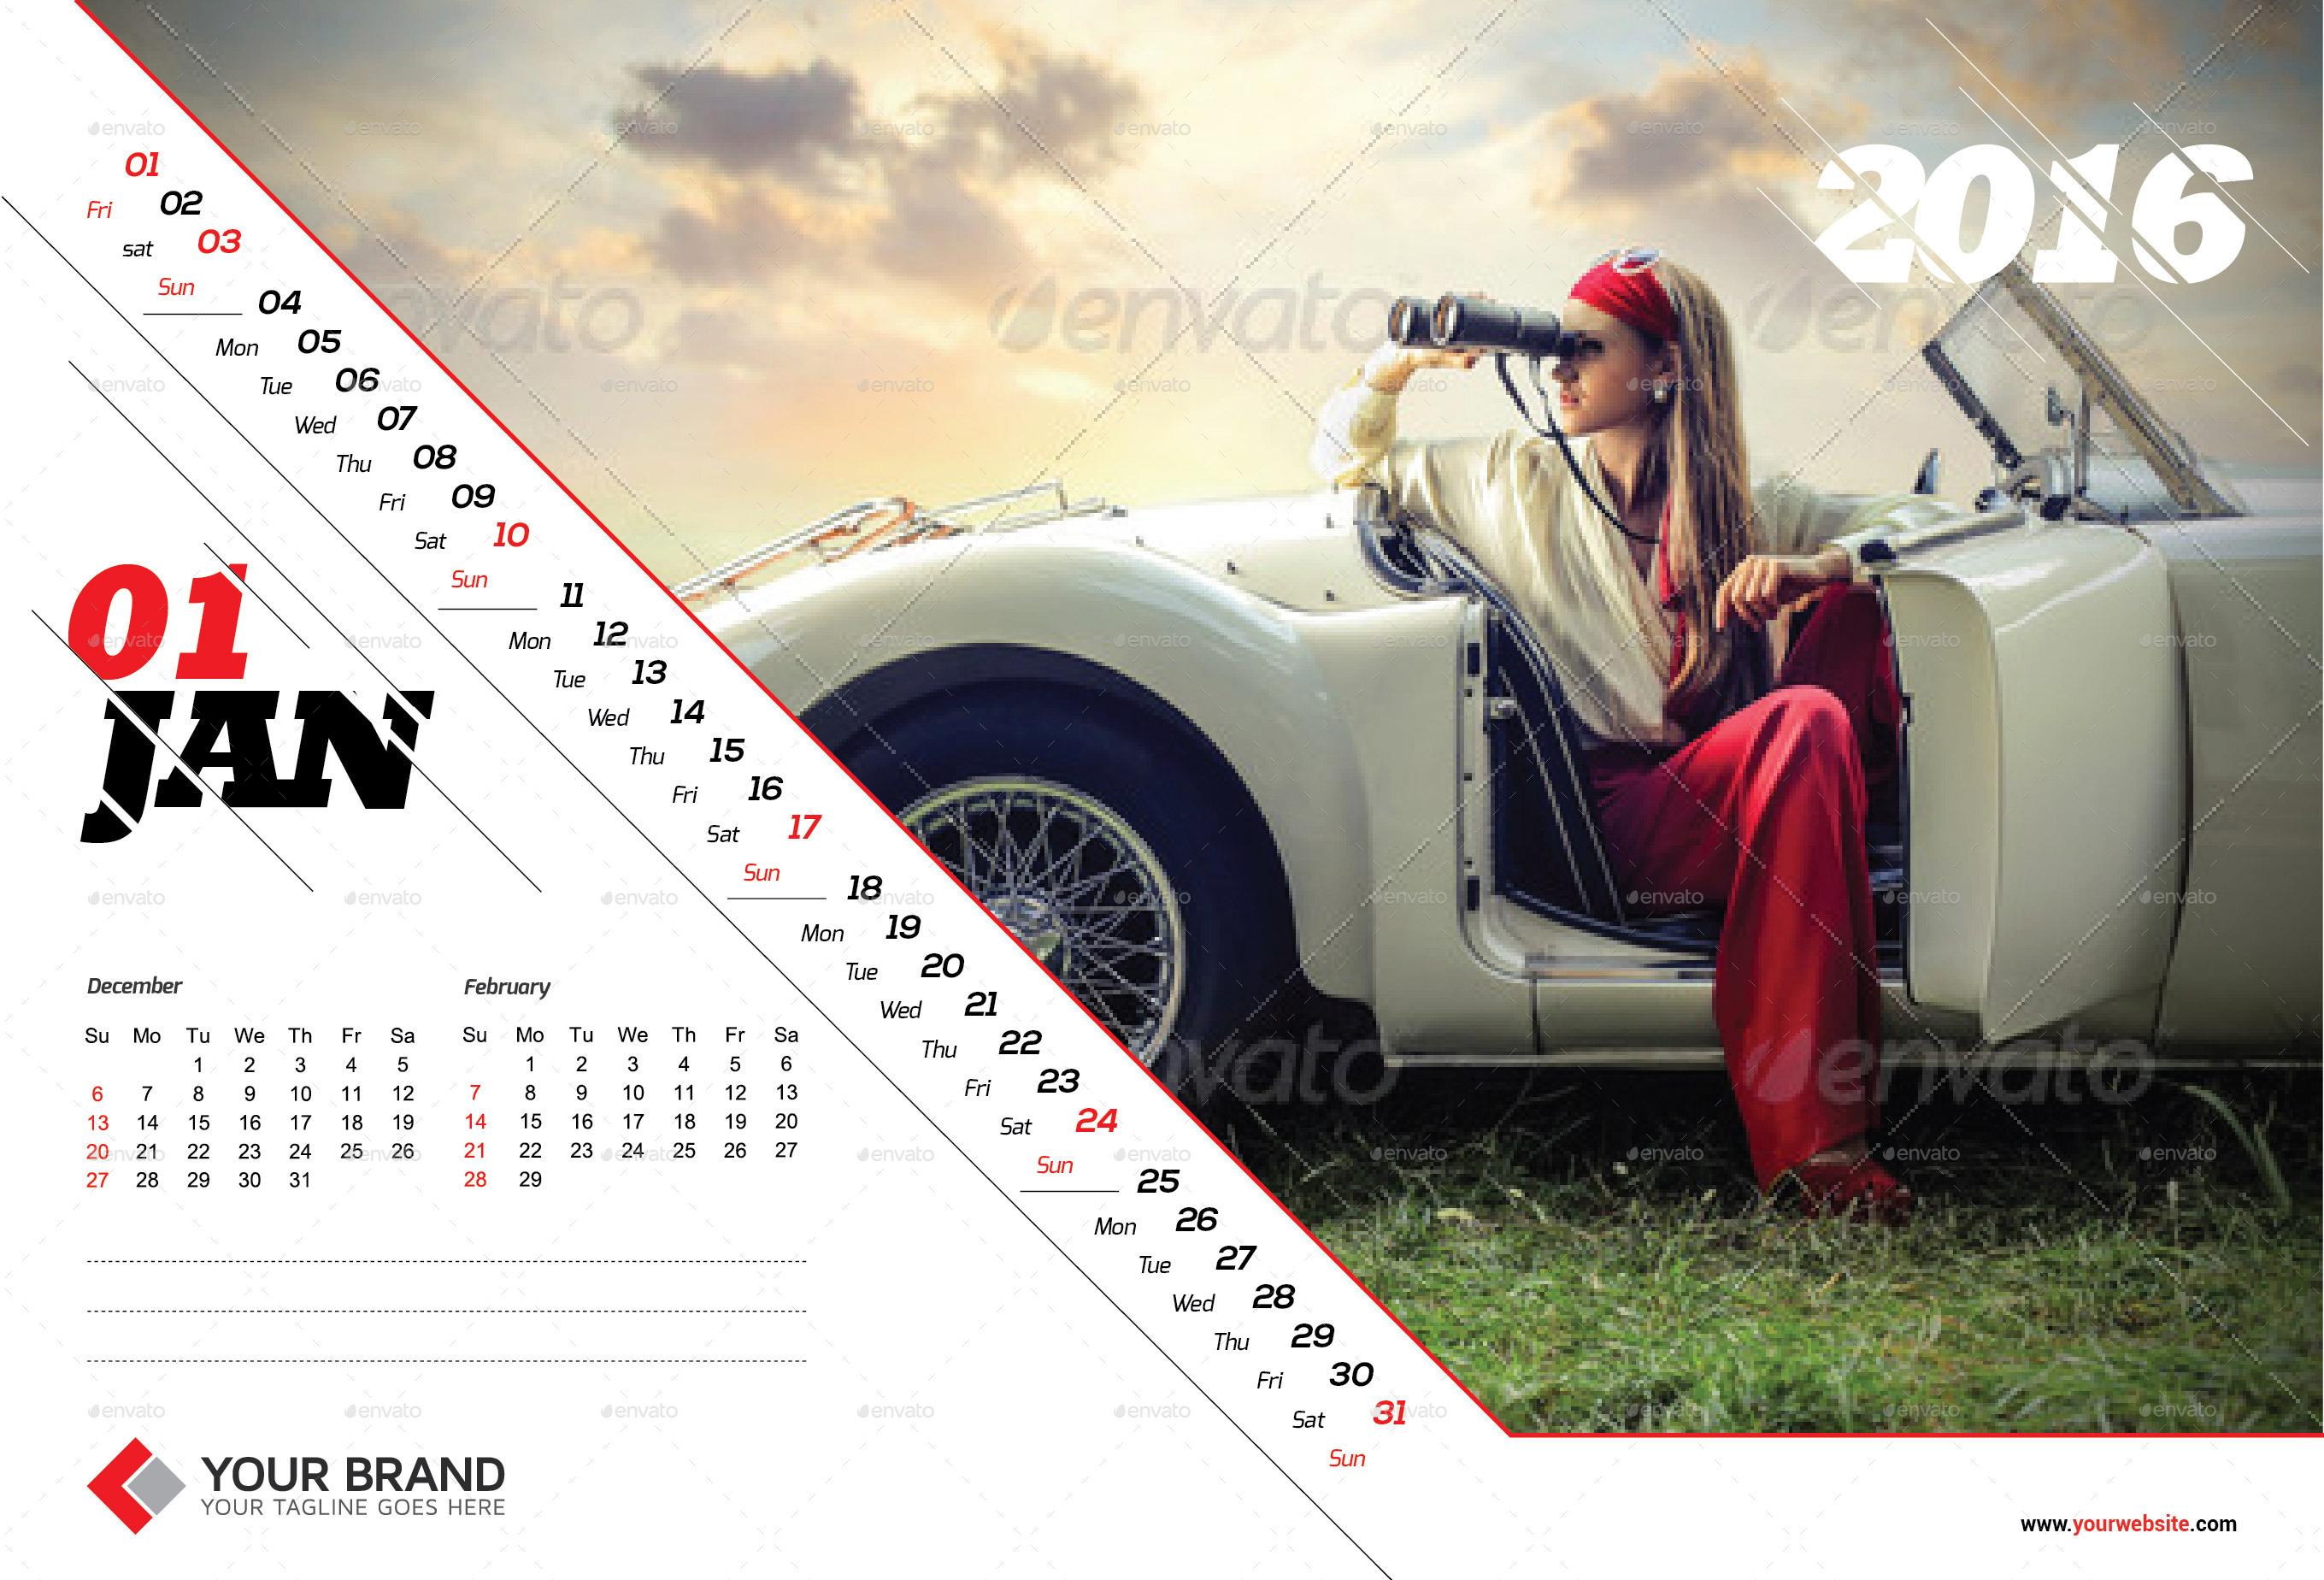 Wall Calendar Design 2016 by olaylay GraphicRiver